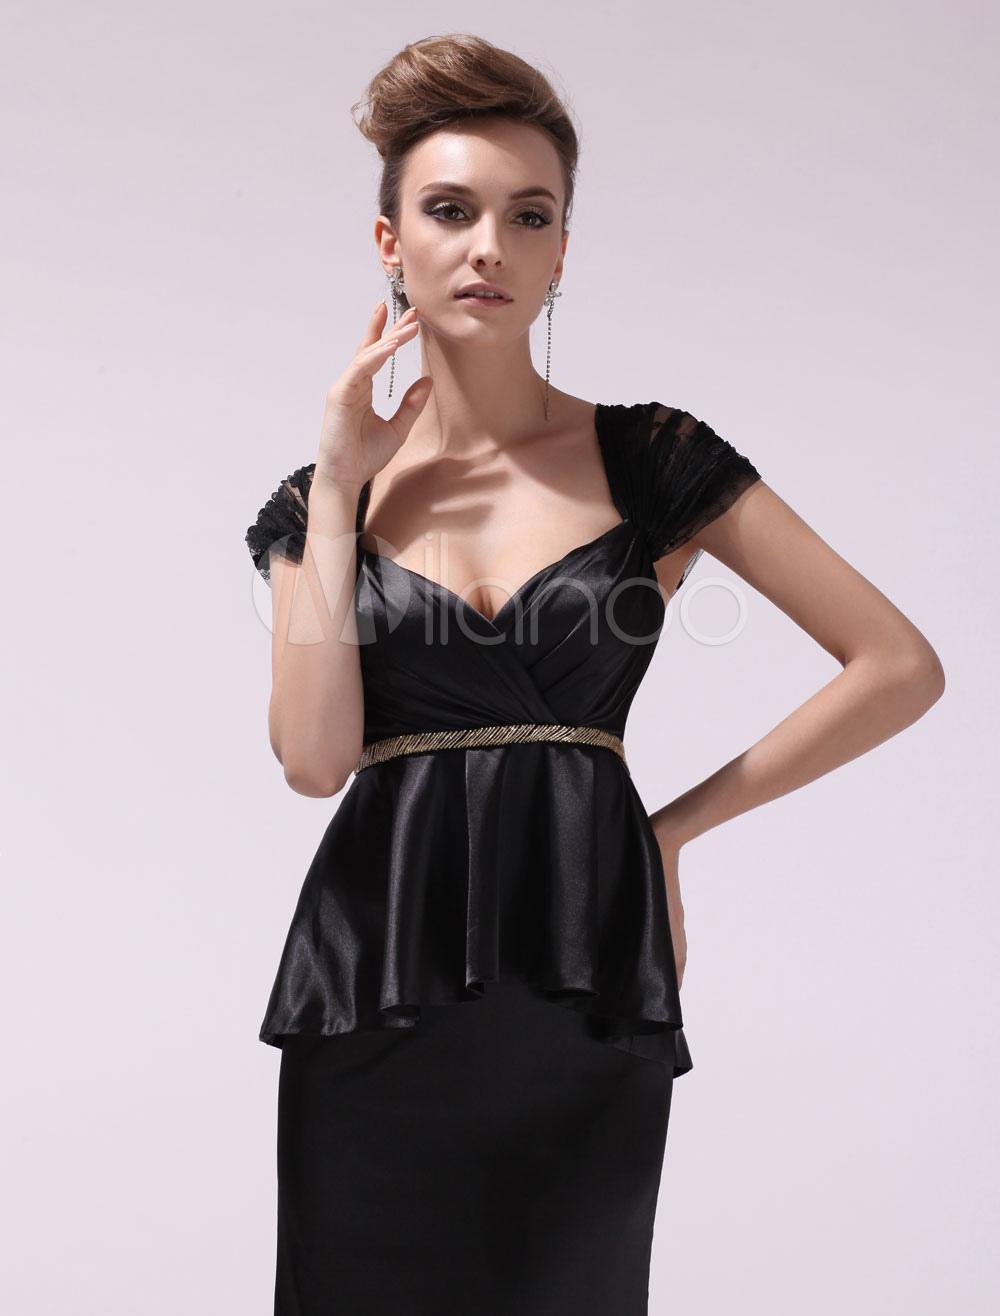 Black Pleated Sweetheart Short Sleeves Mermaid Evening Dress For Women Milanoo (Wedding Evening Dresses) photo